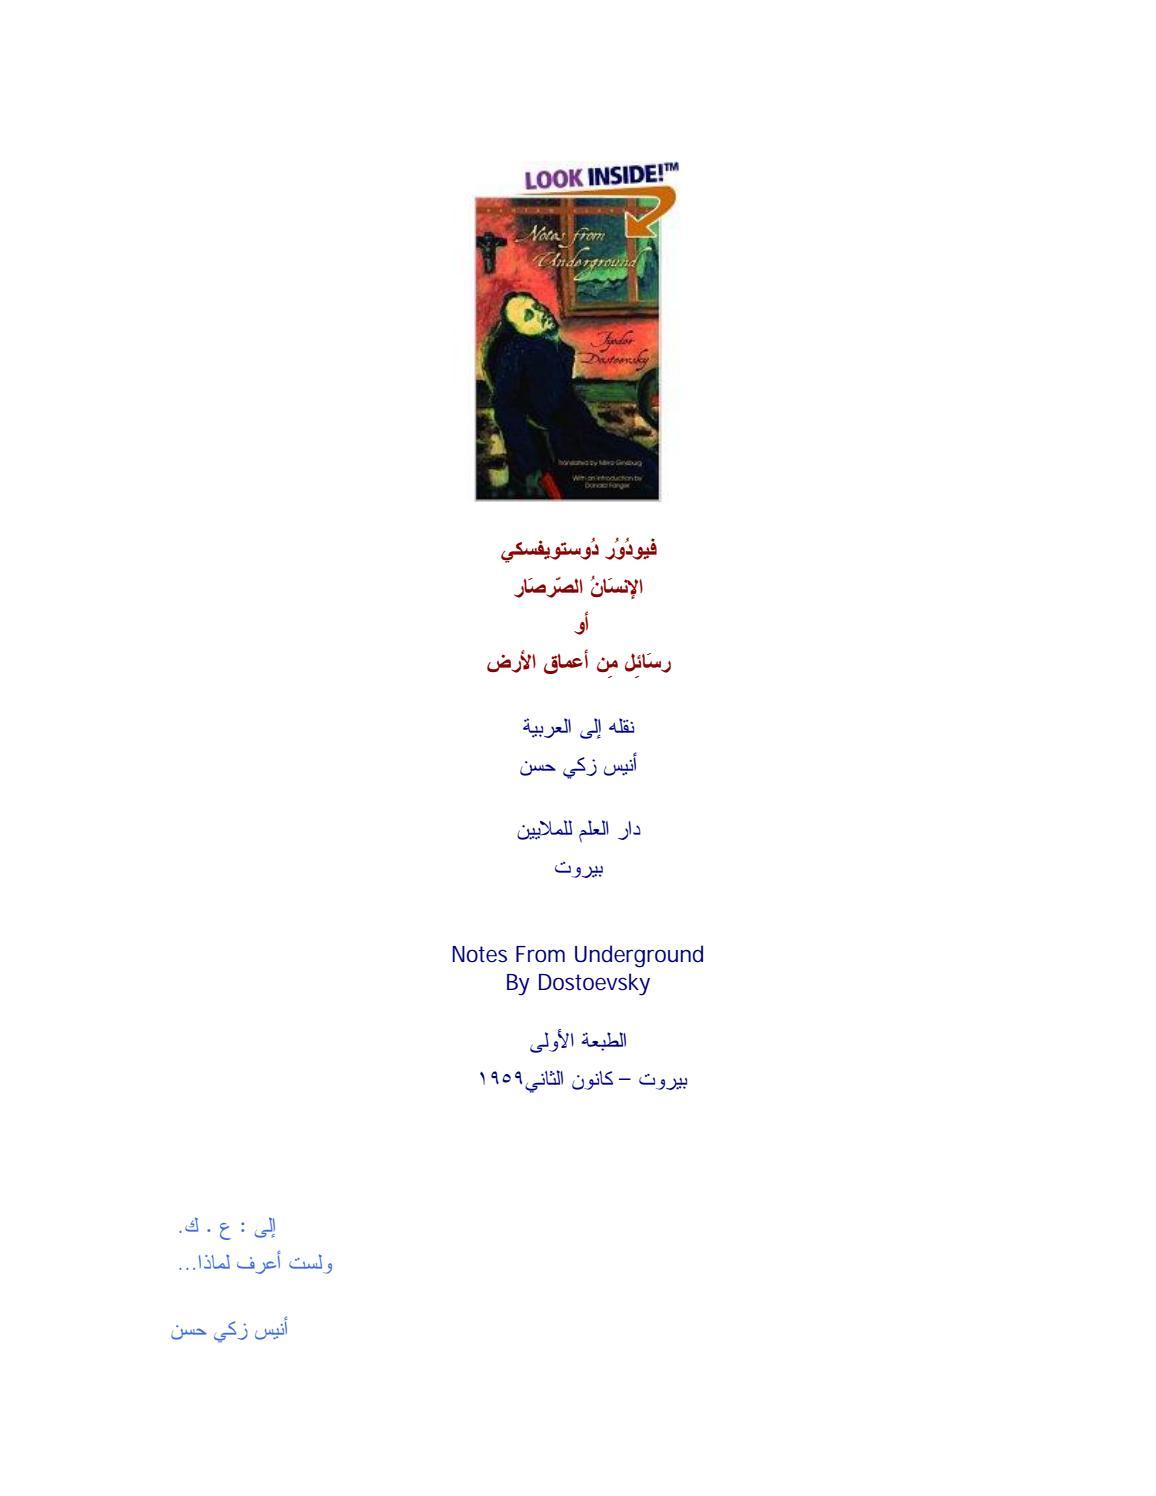 ad8973f5934bf رواية الإنسان الصرصار فيودور دوستويفسكي by أصدقاء القراءة - همام قباني -  issuu